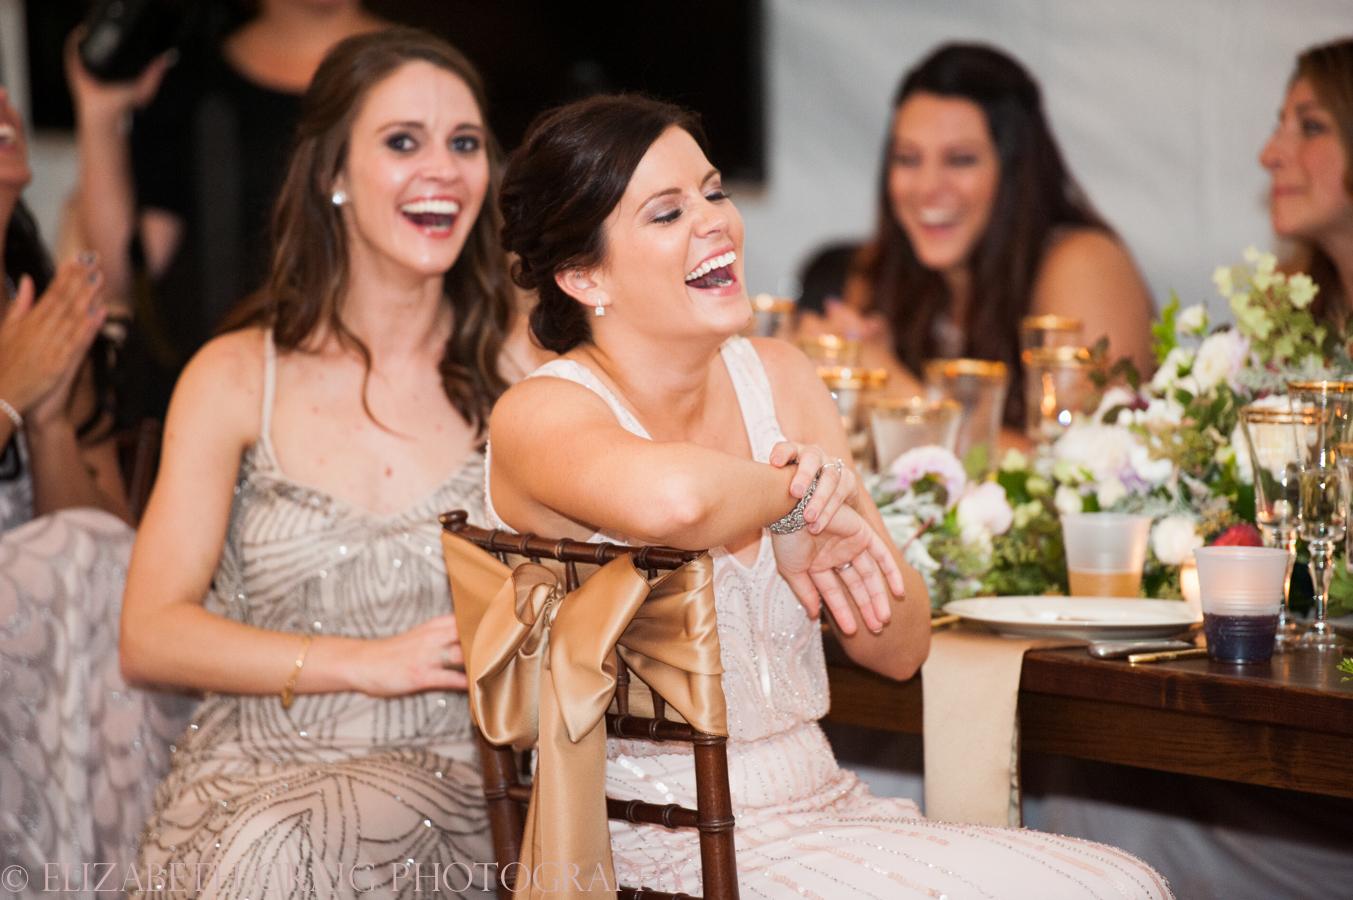 Dubois Brockway St. Marys PA Weddings-0219